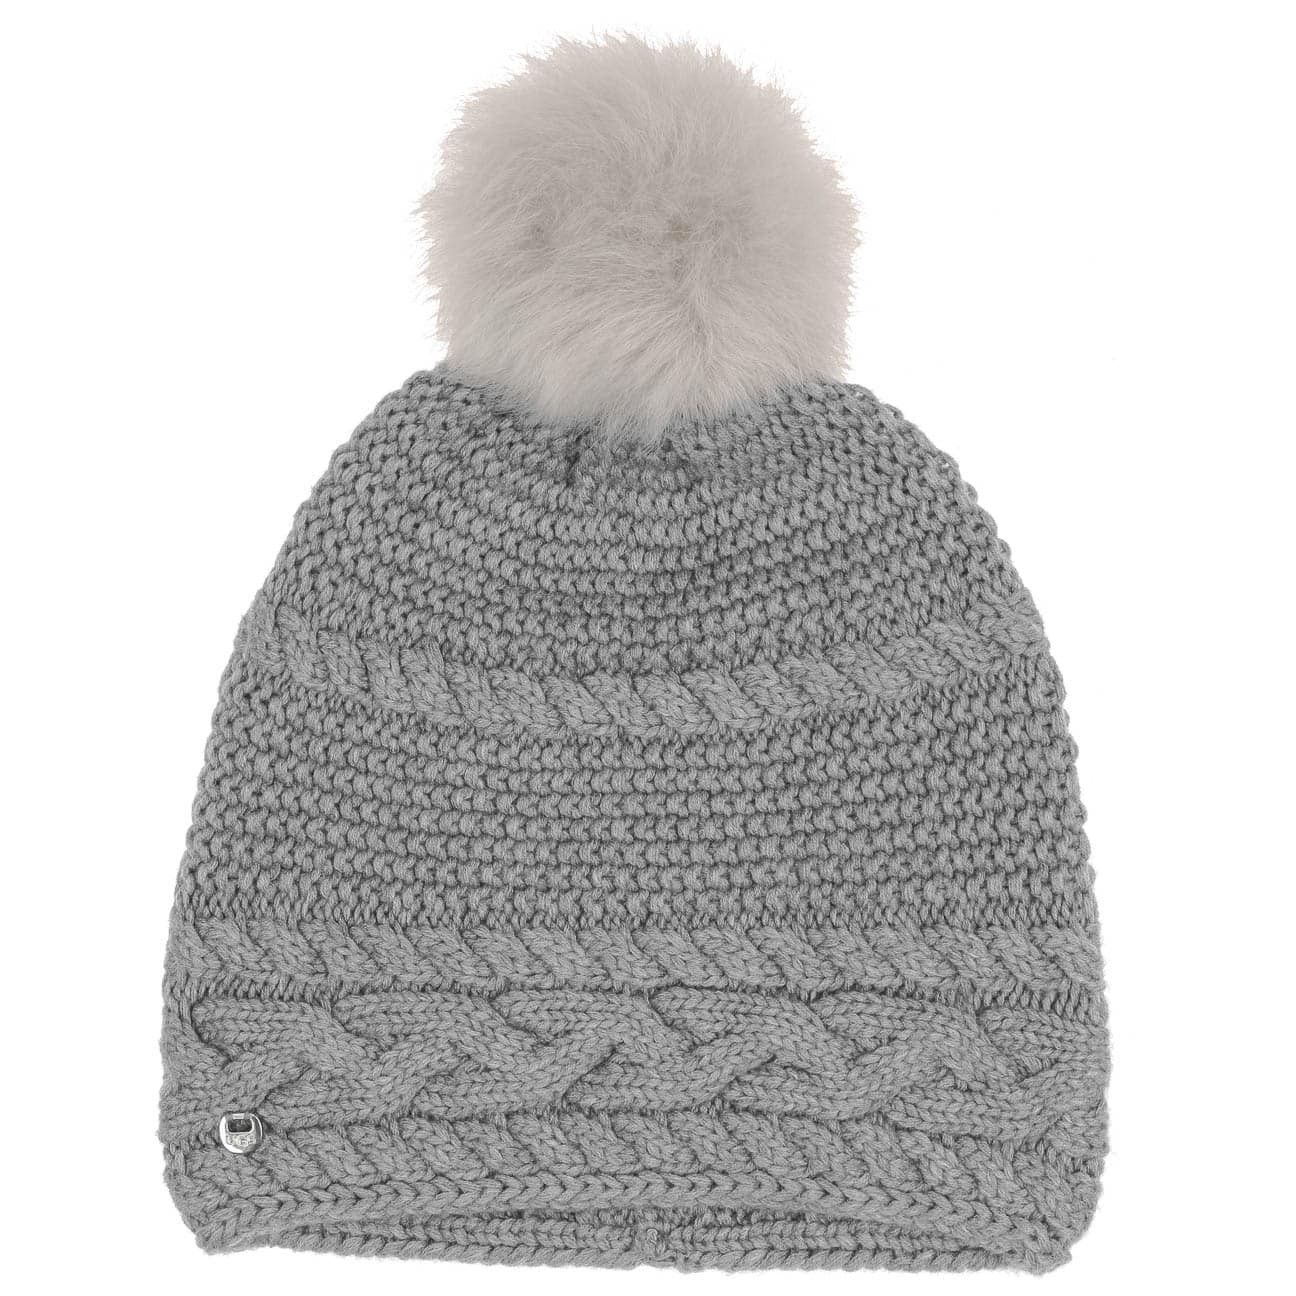 6af8ebefb1c Merino Cable Knit Pompom Hat by UGG - grey 2 ...